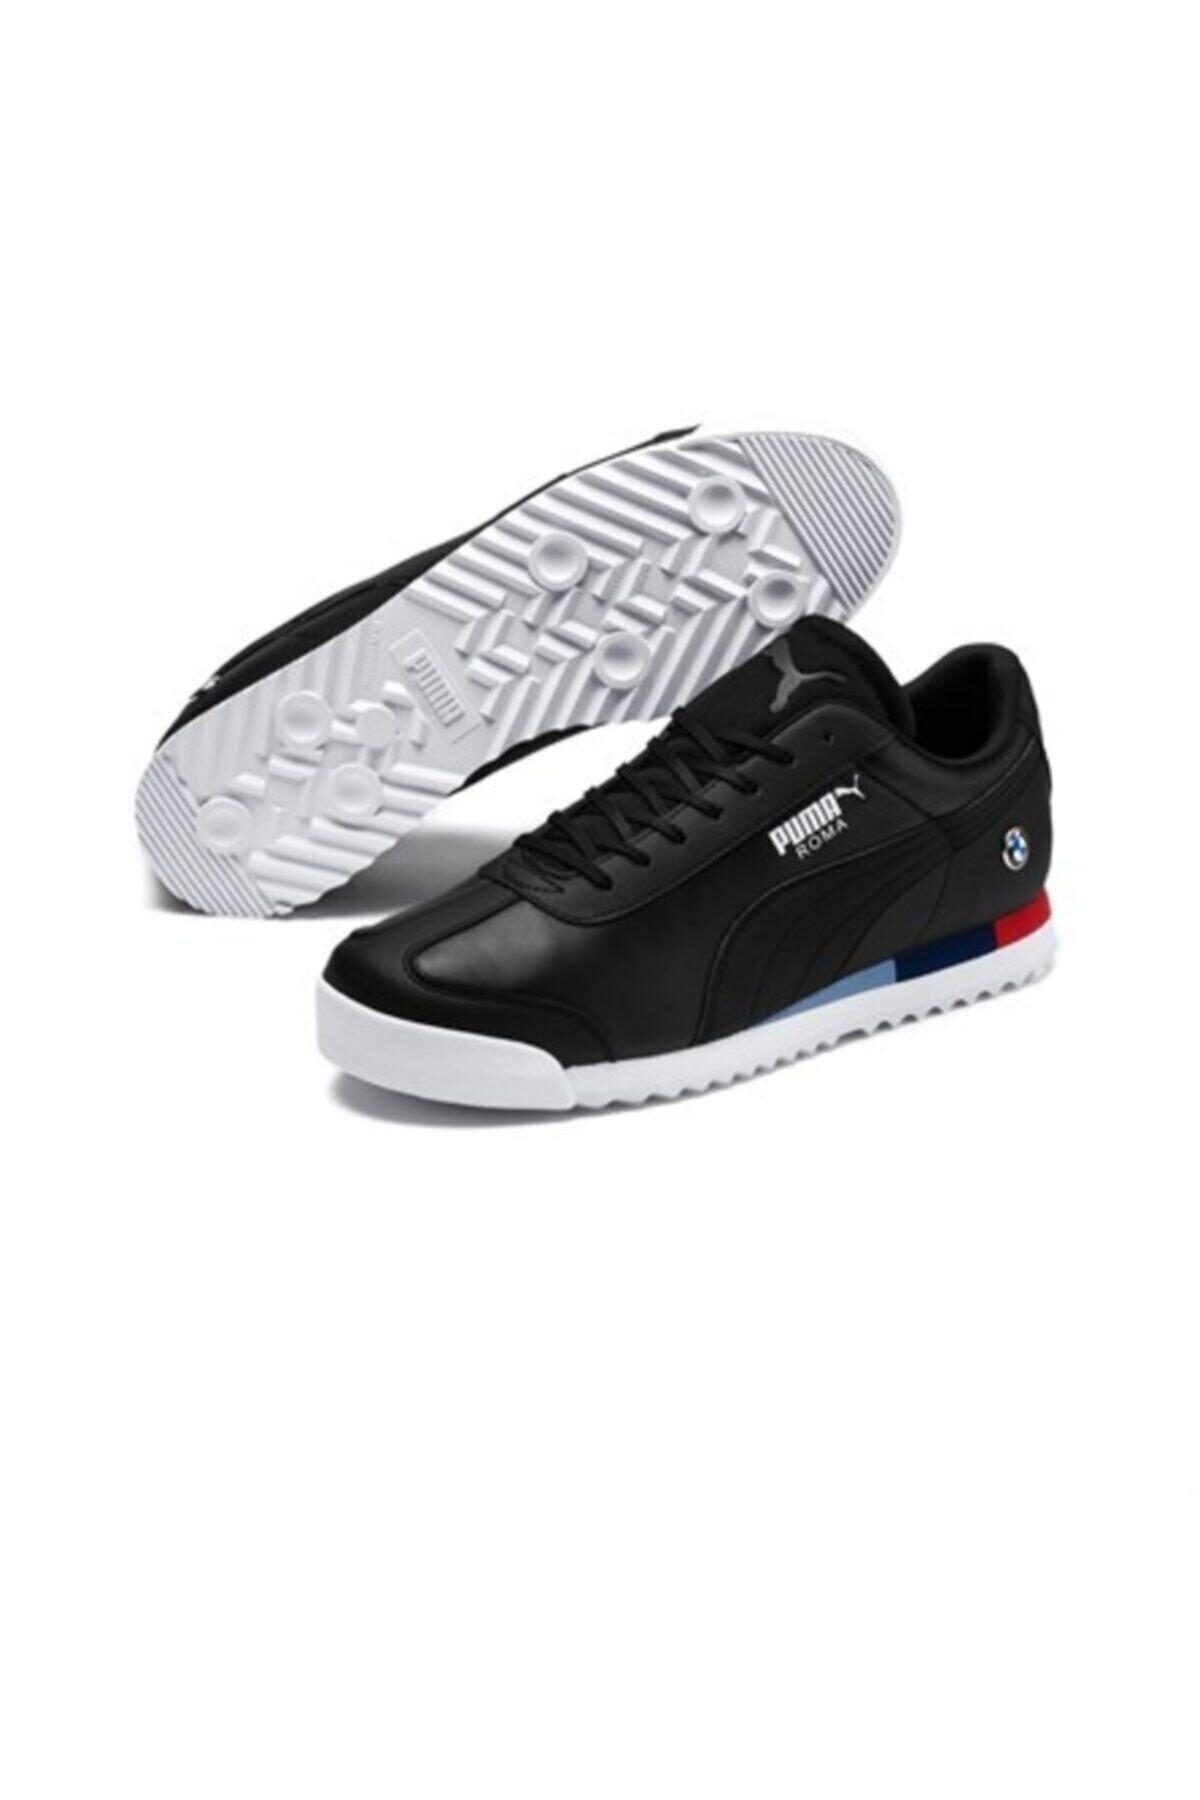 Puma Erkek Siyah Bmw Mms Roma Spor Ayakkabı 1